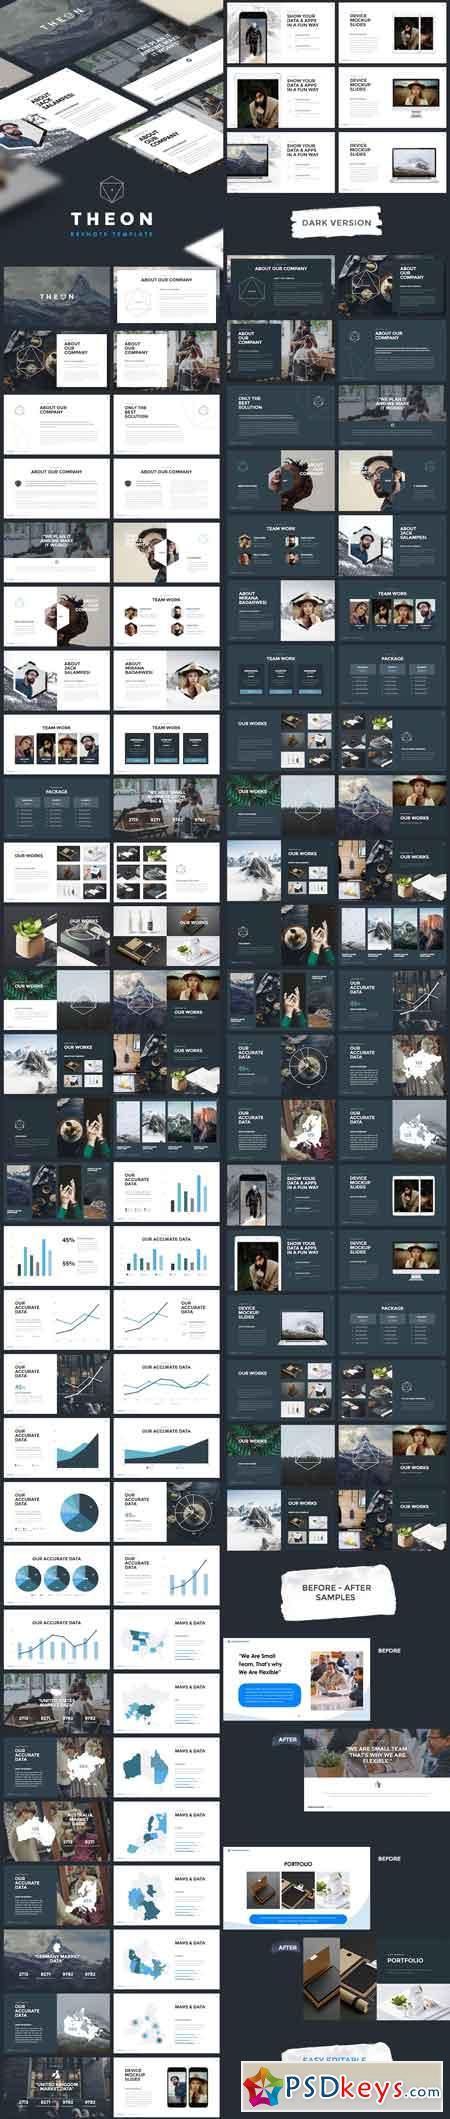 THEON - Minimal & Creative Keynote Template 17653000